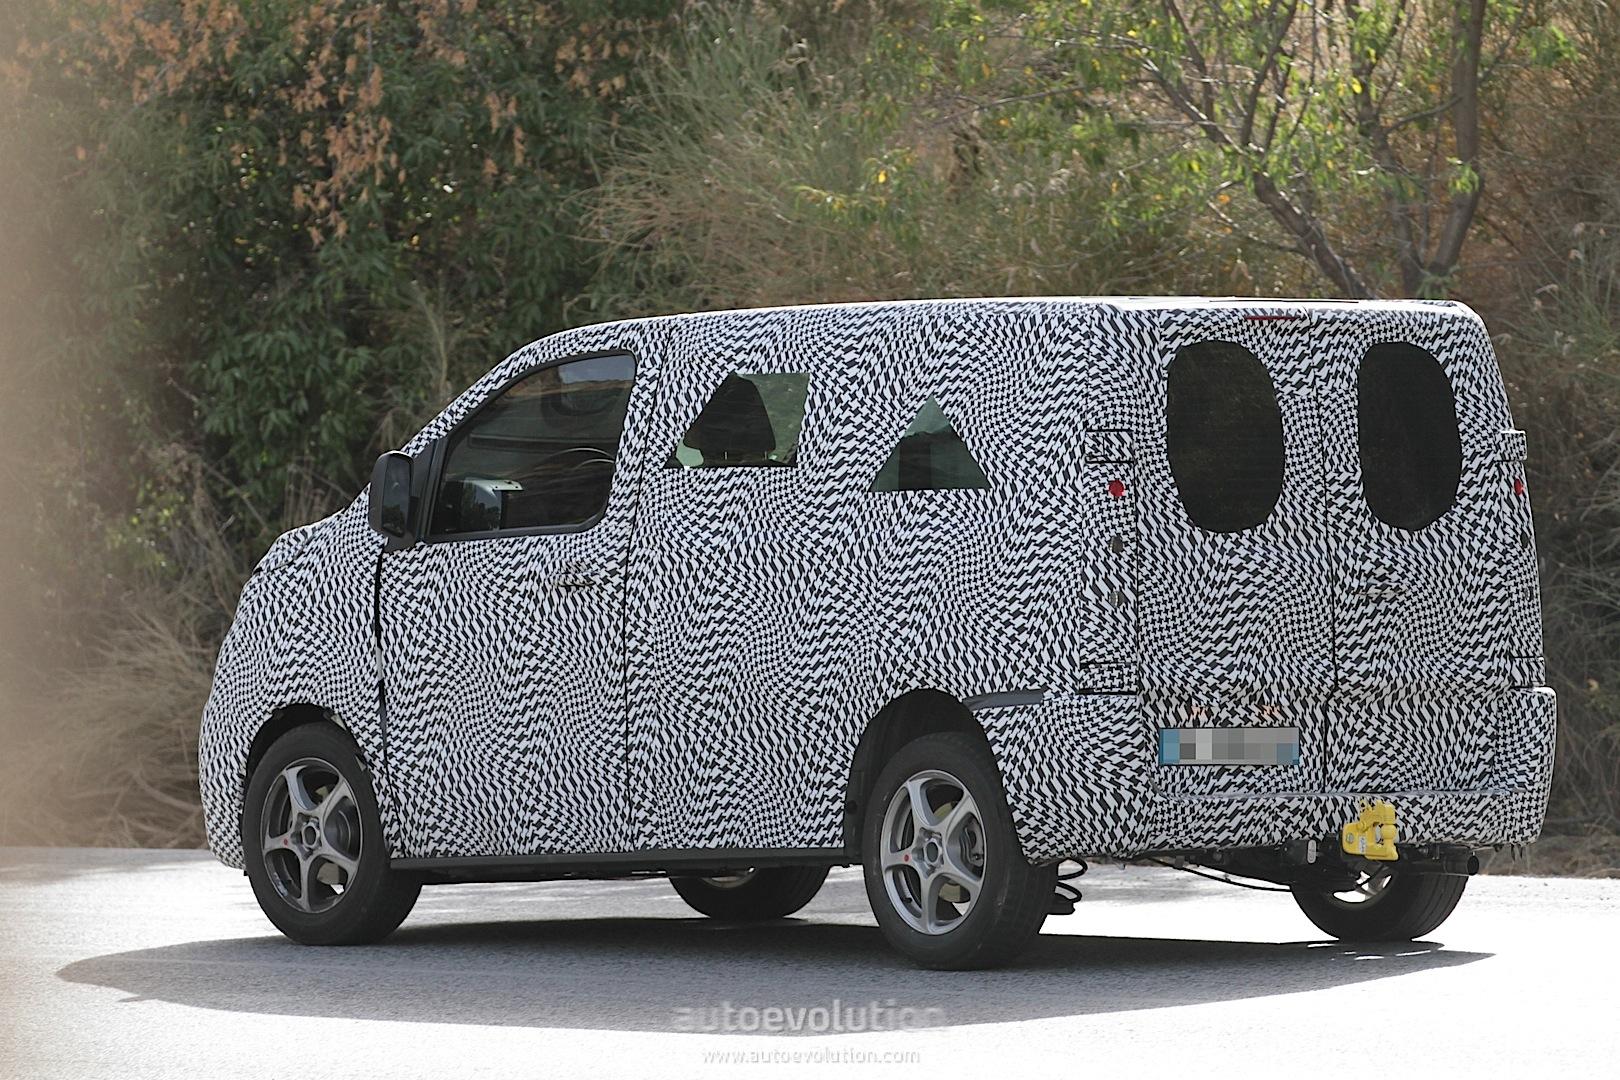 2016 - [Citroën/Peugeot/Toyota] SpaceTourer/Traveller/ProAce - Page 3 2016-citroen-jumpy-peugeot-expert-spied-photo-gallery_12